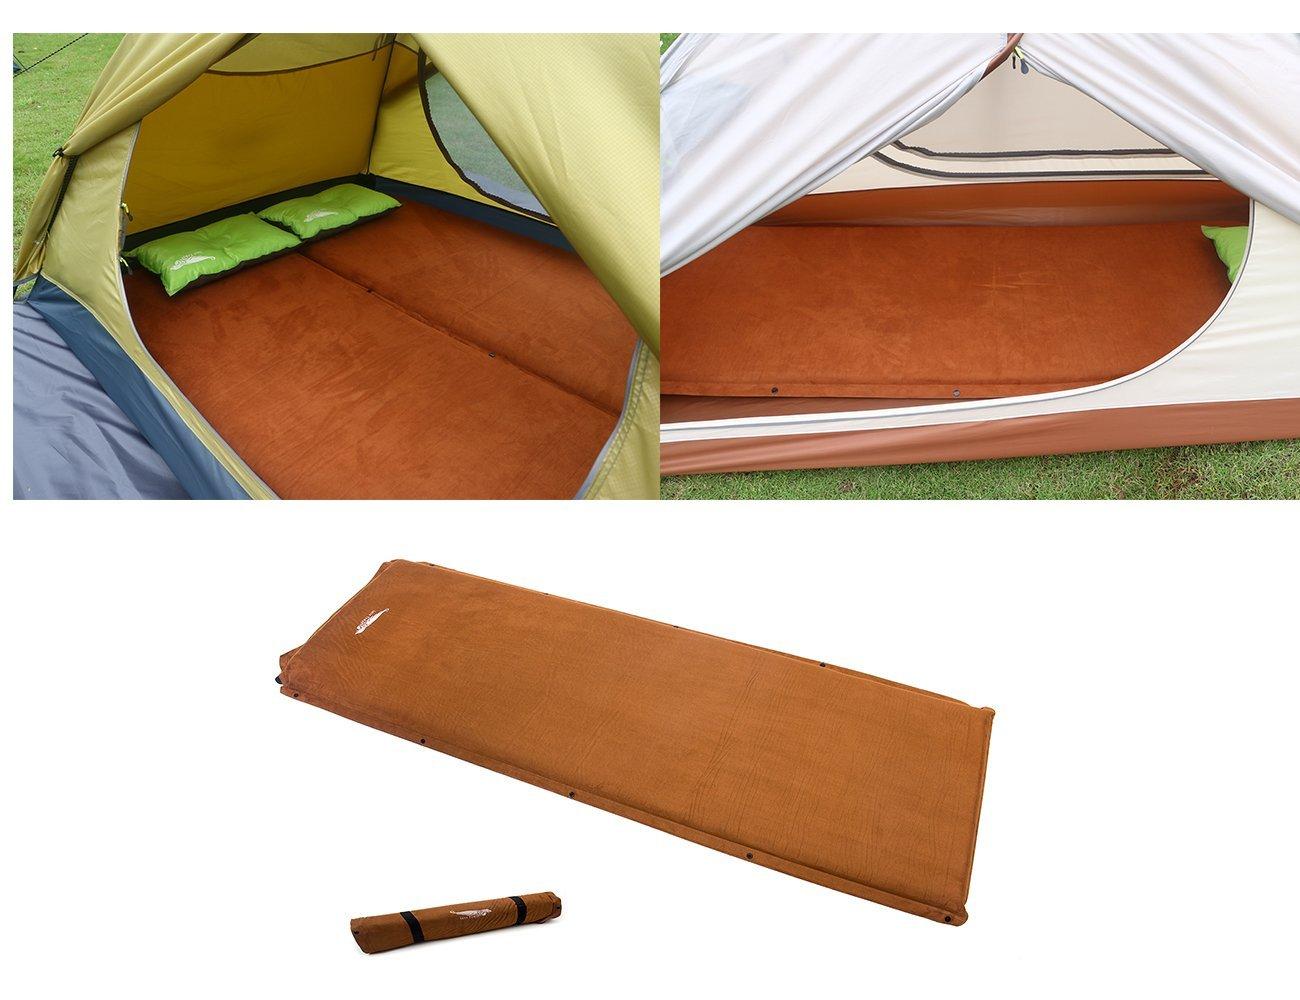 Self-Inflating Camping Pad